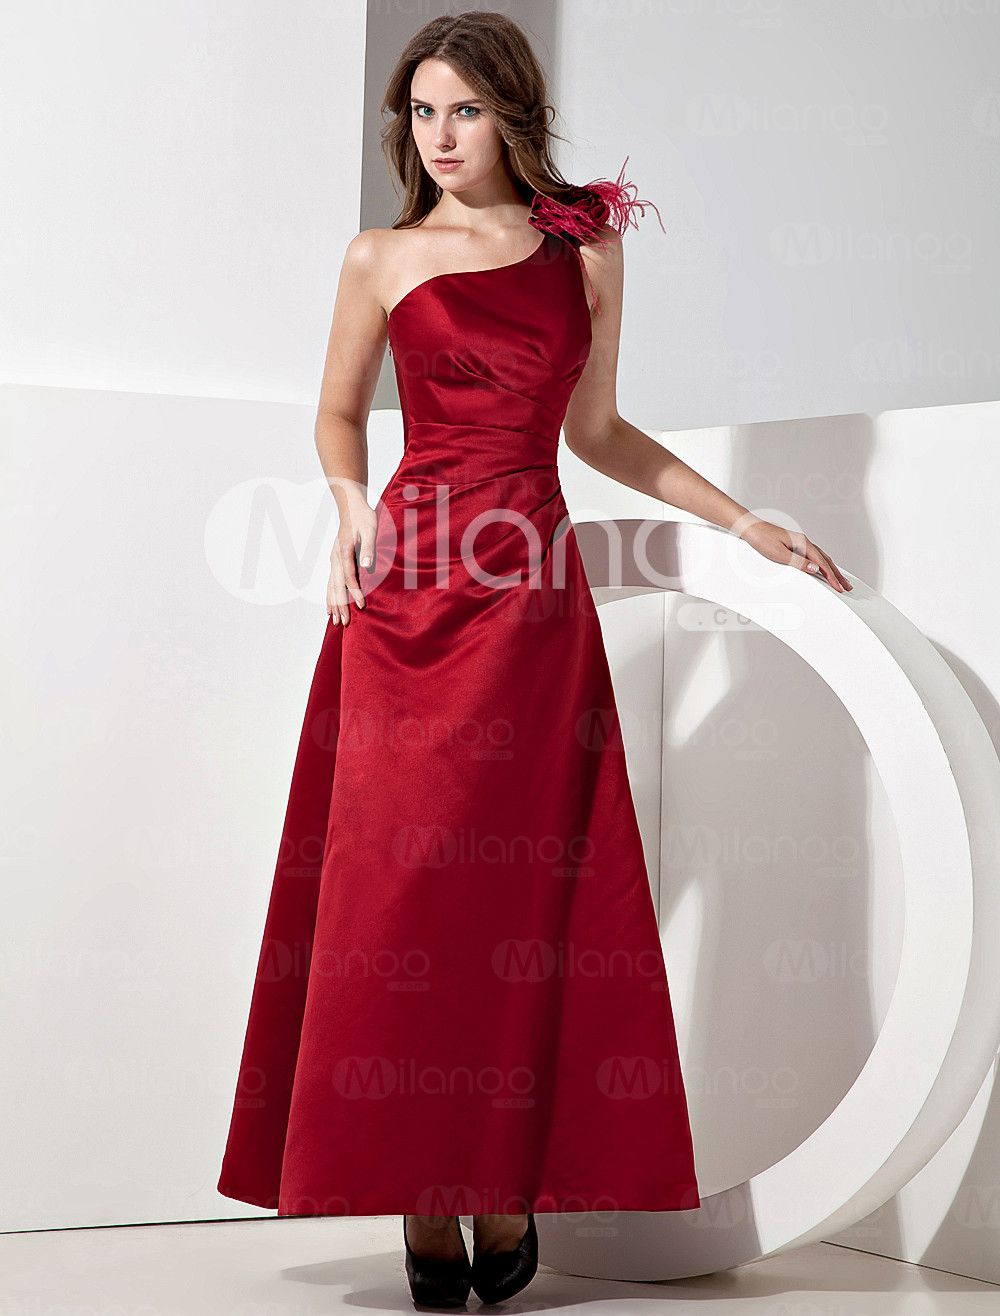 Elegant red satin oneshoulder womens bridesmaid dress